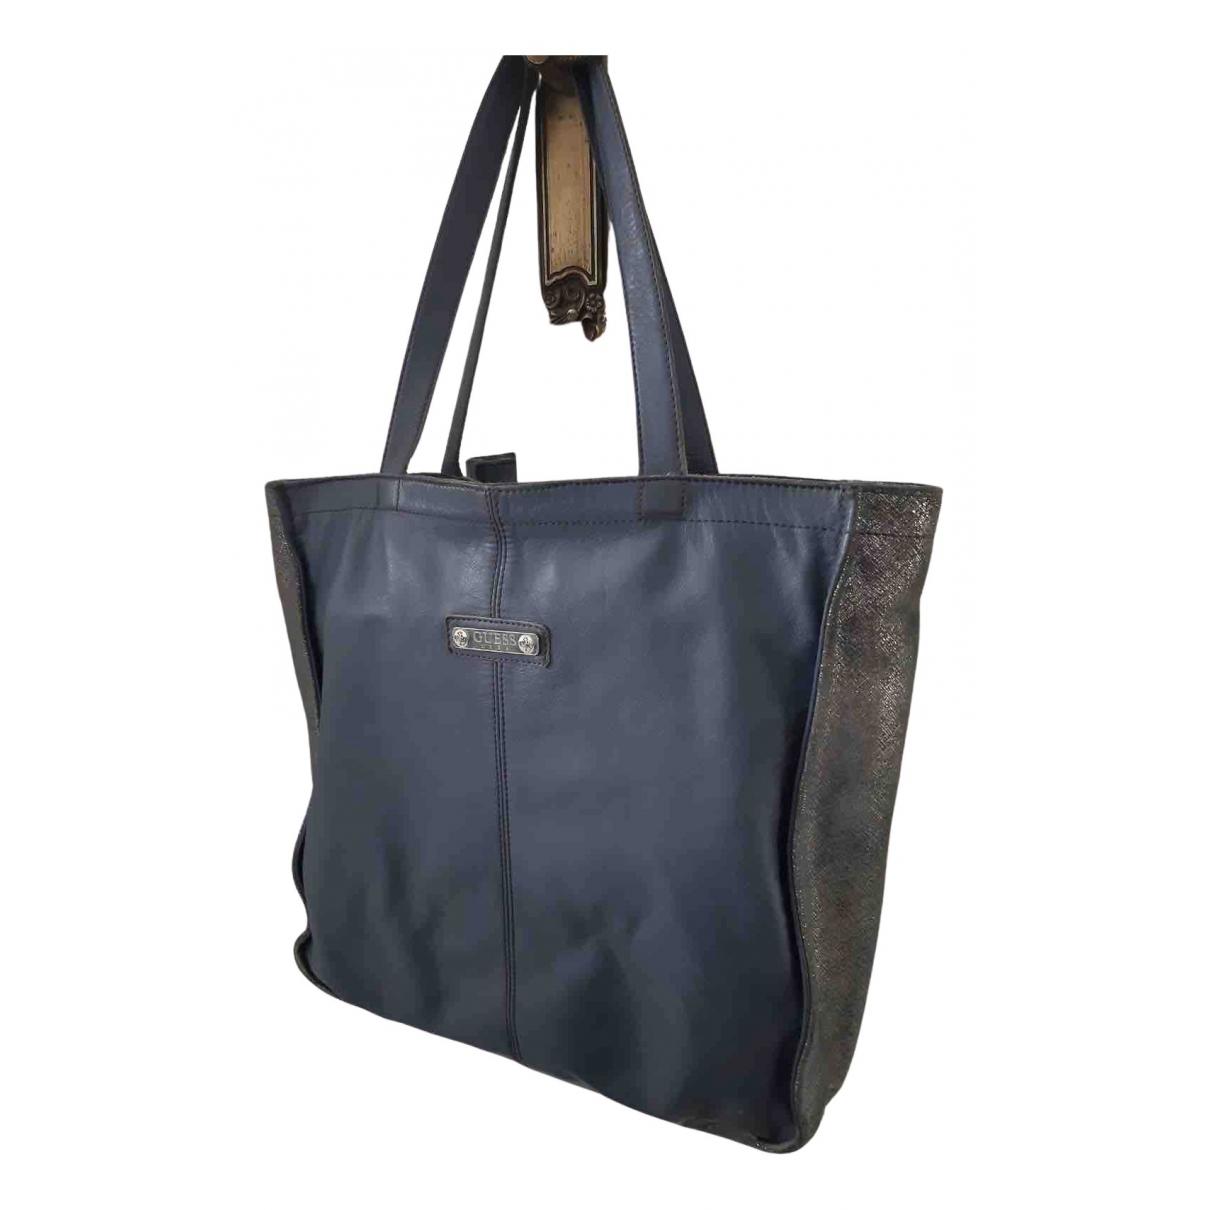 Guess \N Handtasche in  Grau Leder